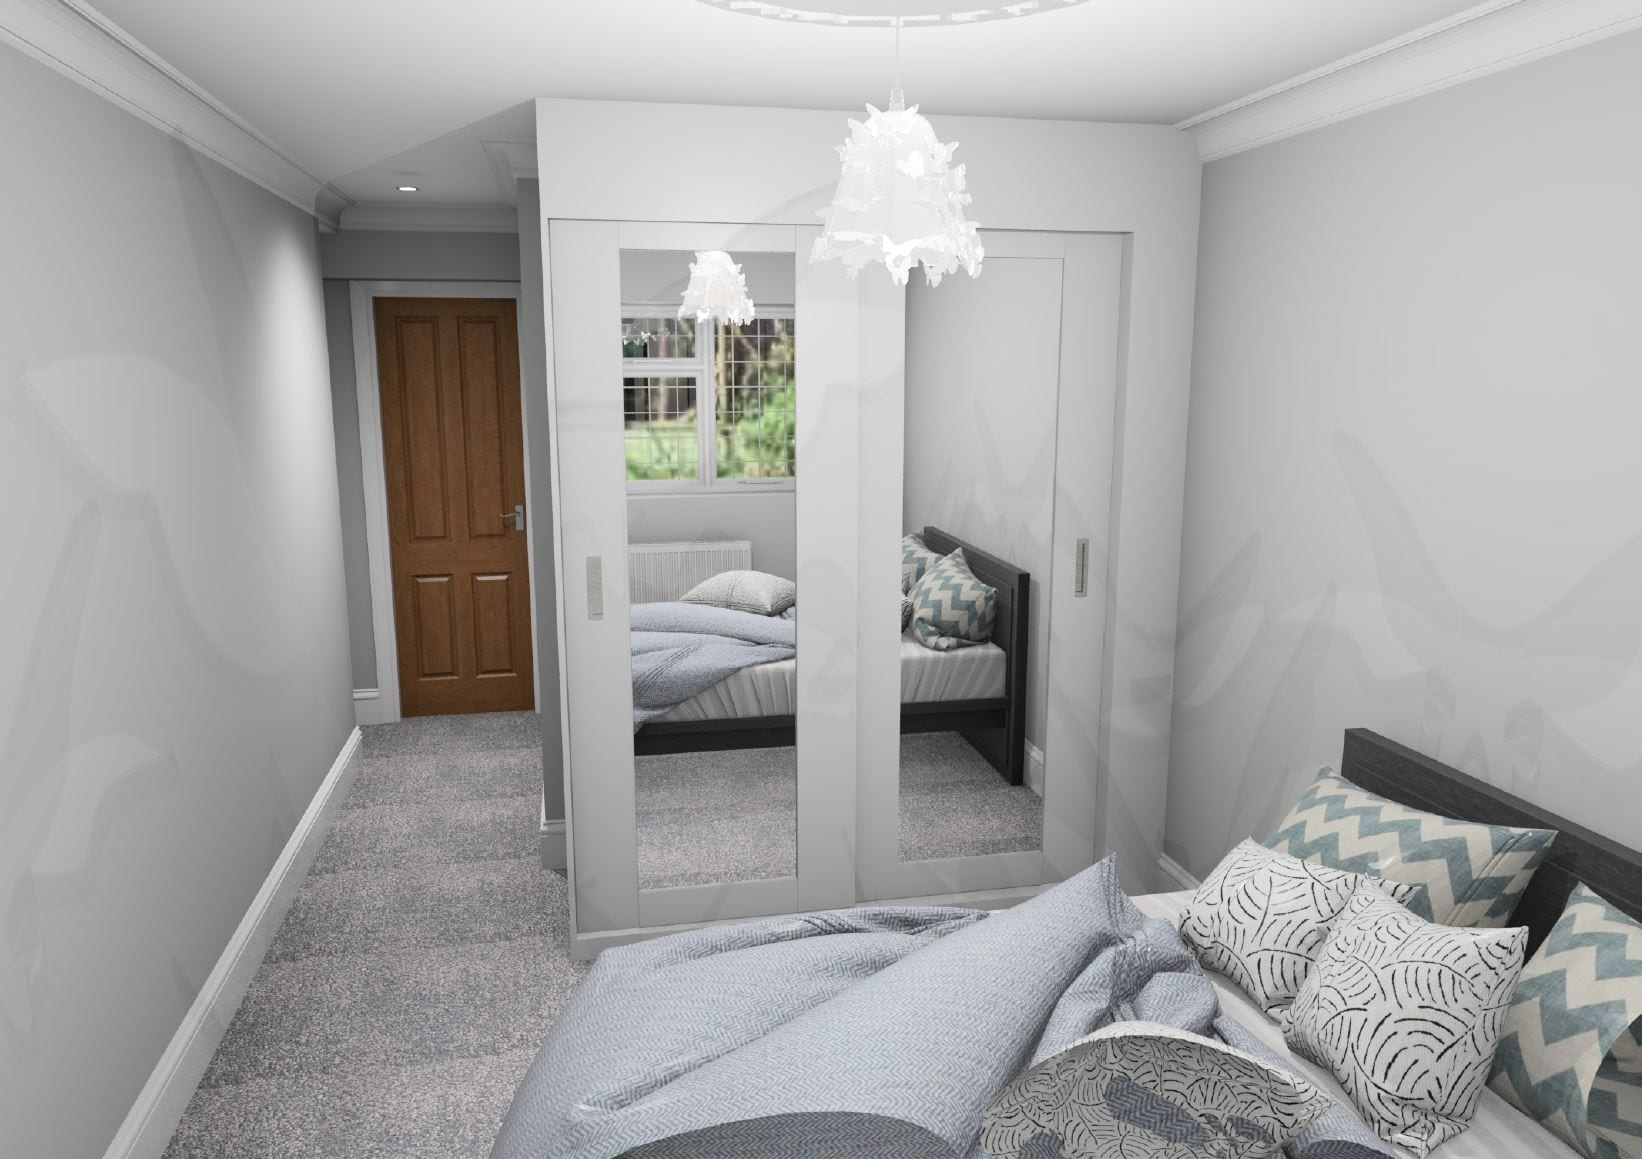 Bespoke_Bedroom_Furniture